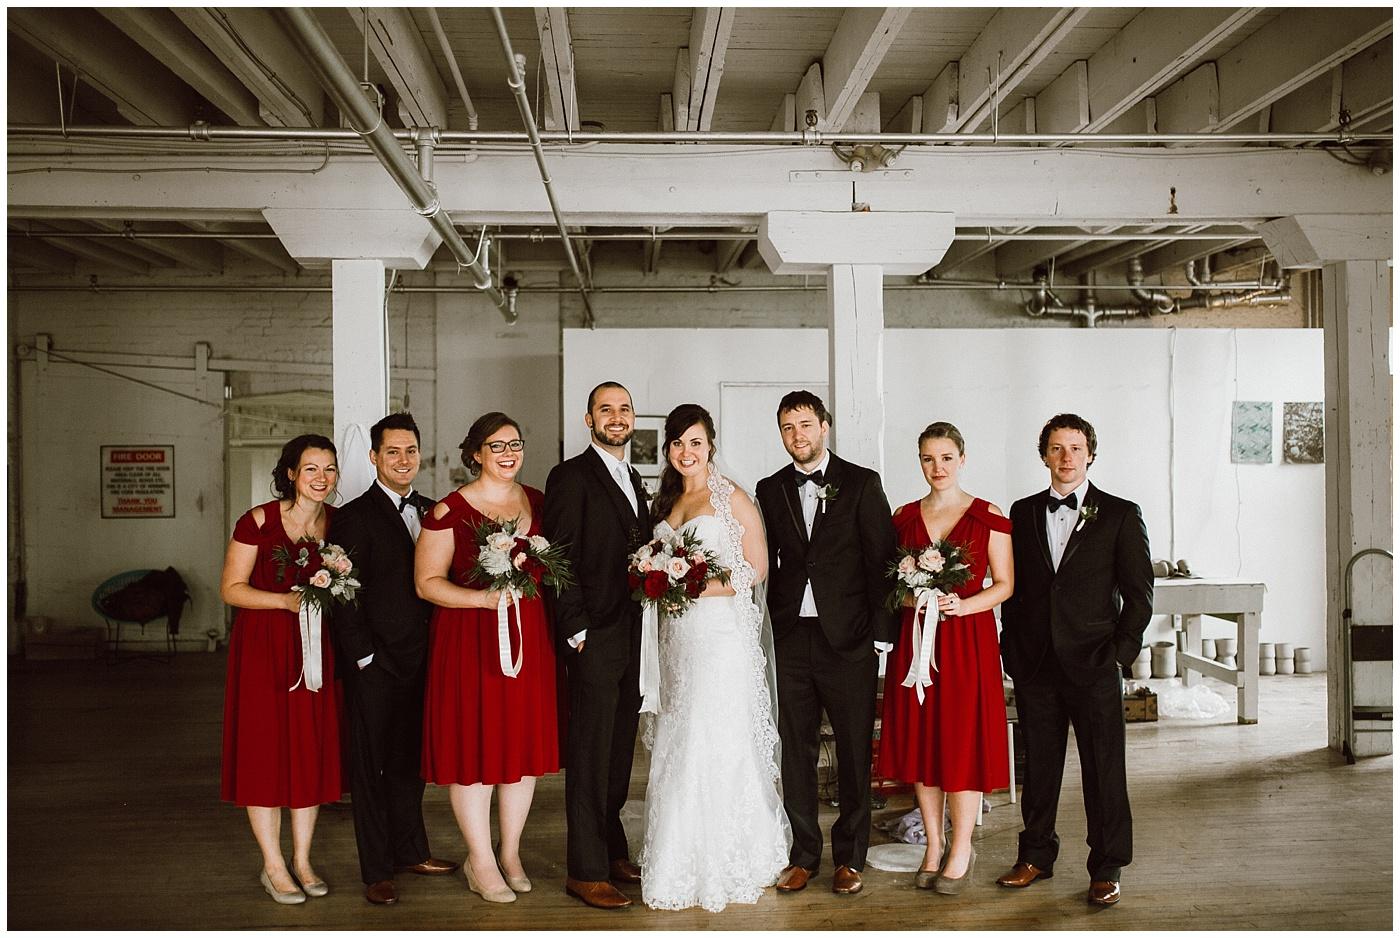 Qualico Family Centre Wedding In Winnipeg Ariana Tennyson Photography